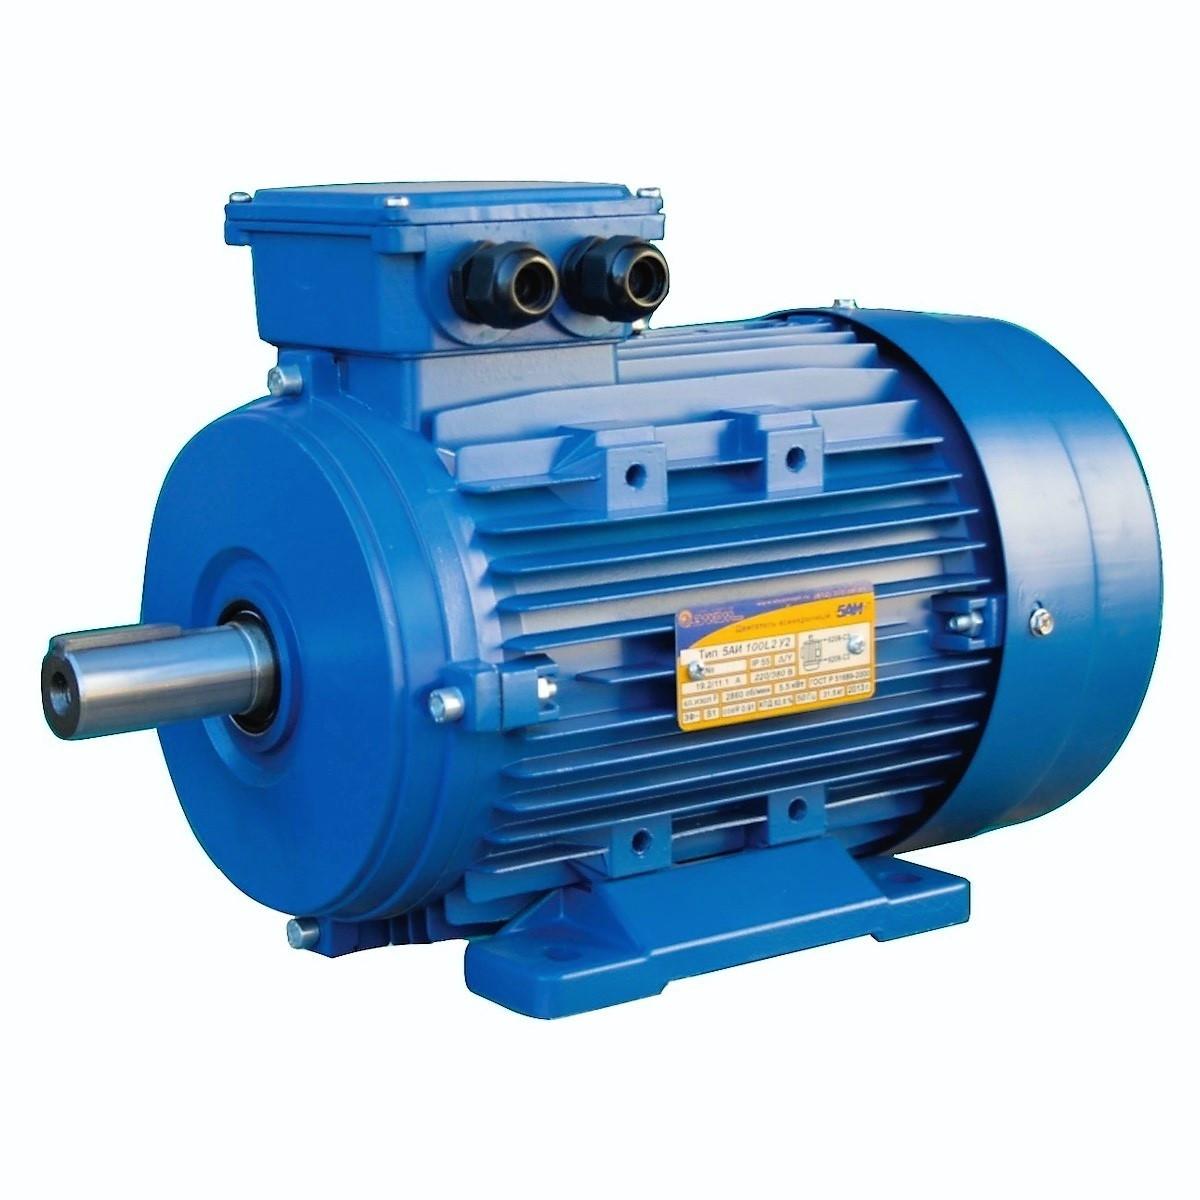 Электродвигатель 5АИ 112 M4 5.5 кВт, 1500 об/мин